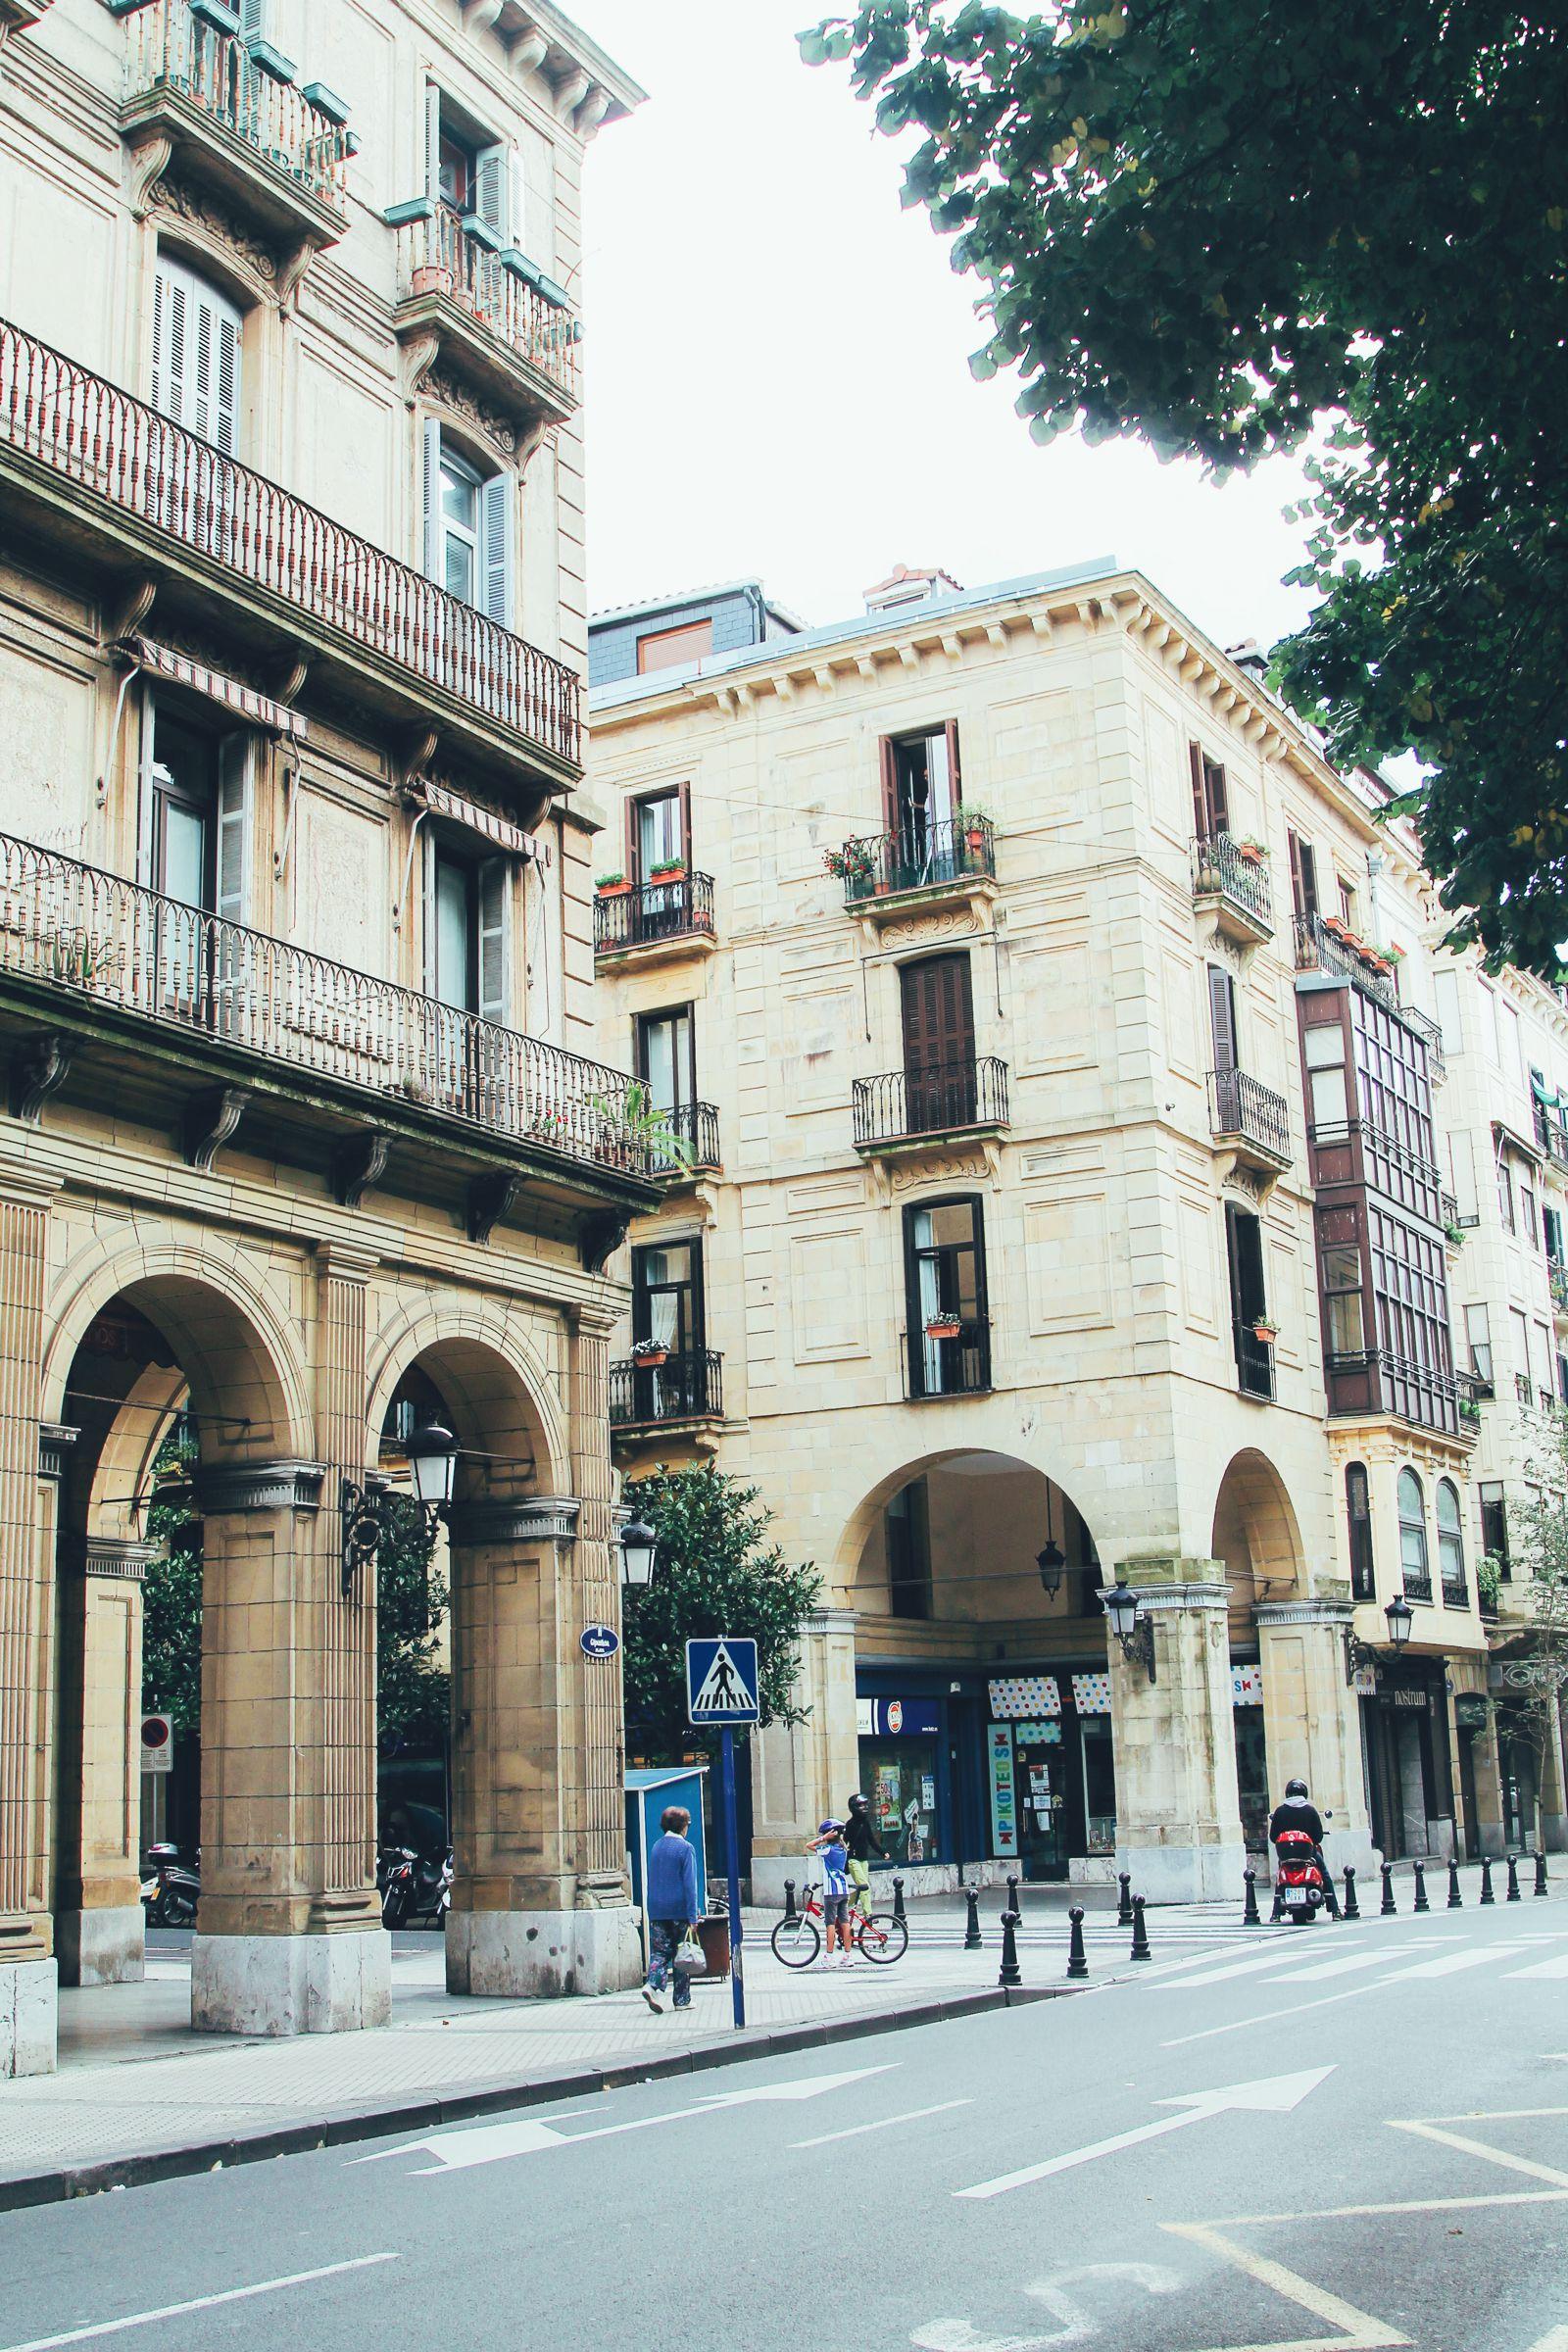 The Most Beautiful City in Spain. San Sebastian, Gipuzkoa, Spain, Hotel Londres (3)